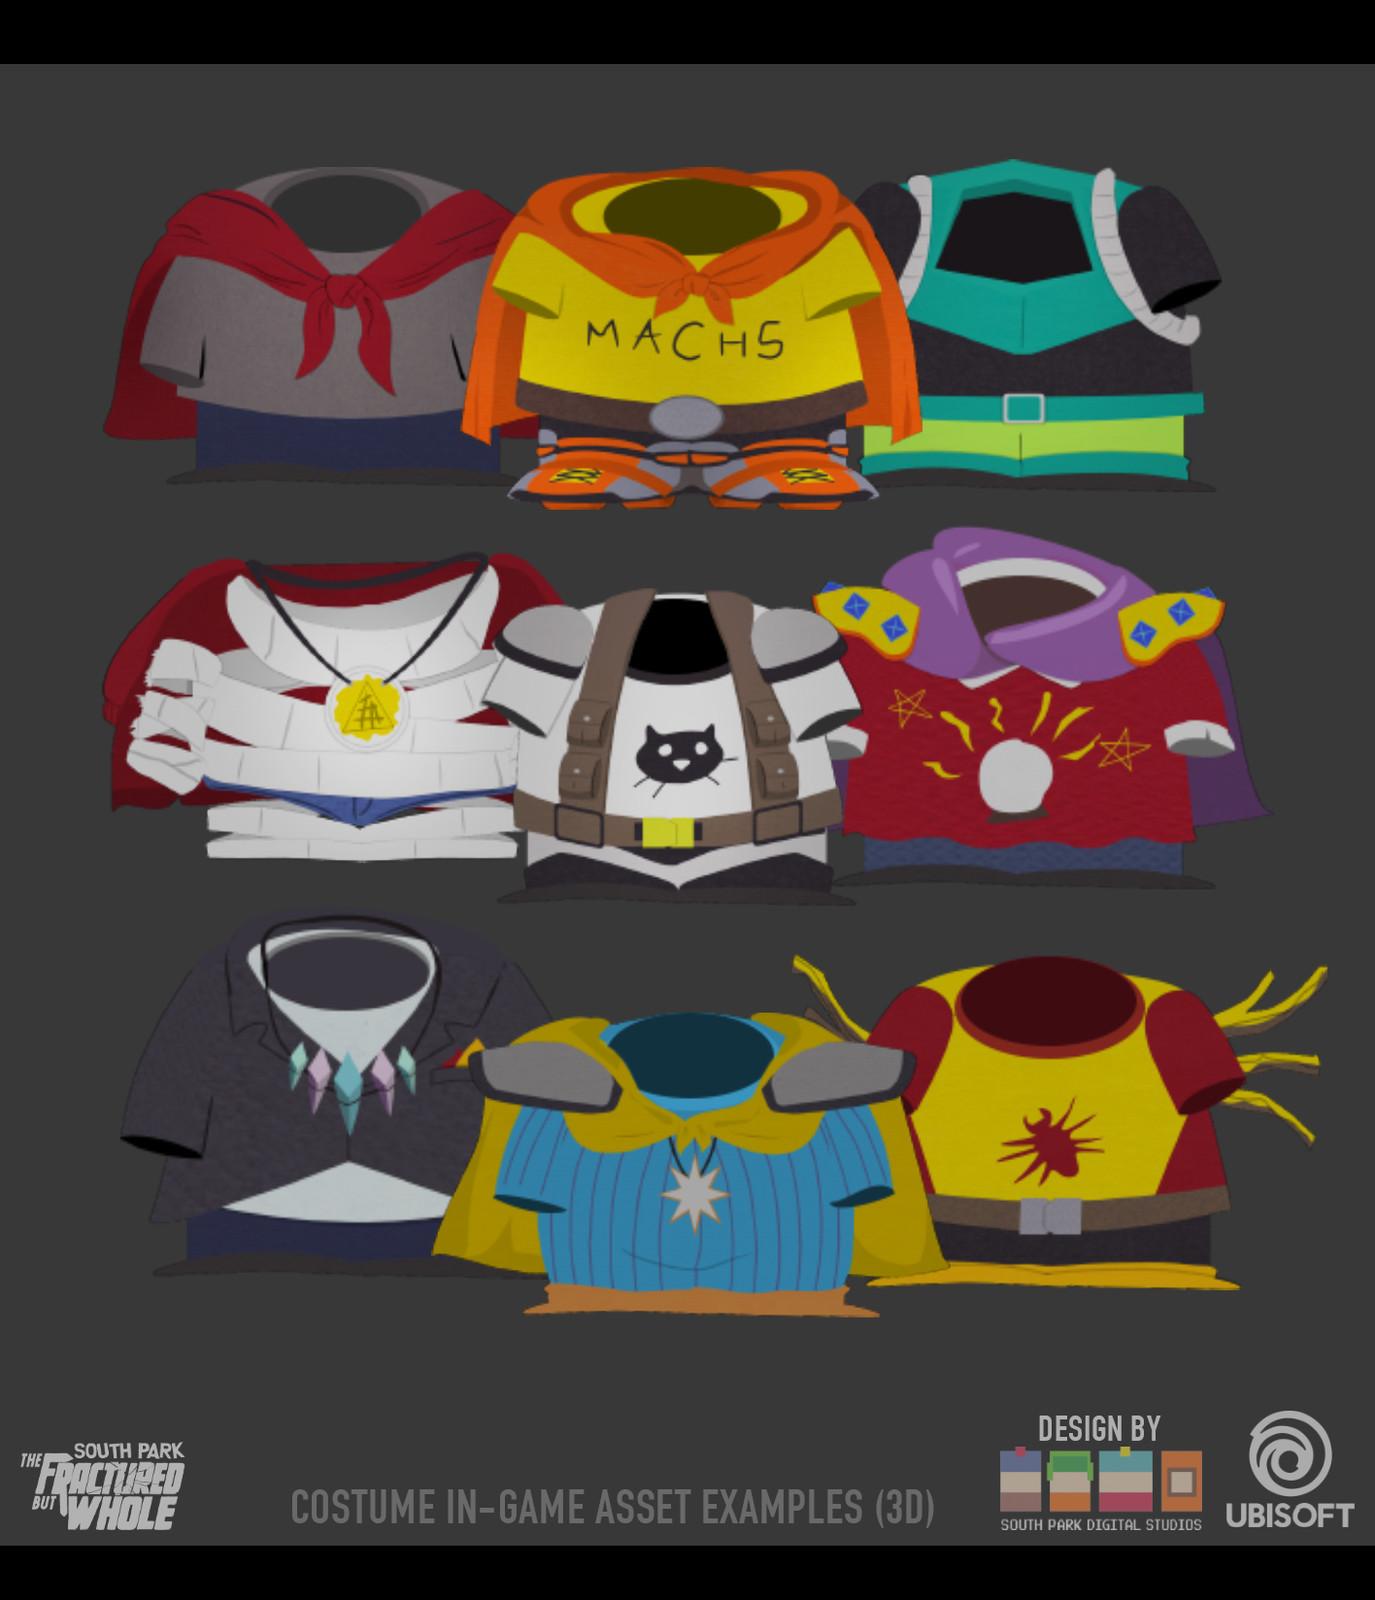 Selection of costumes made in Maya - Original Designs by South Park Digital Studios